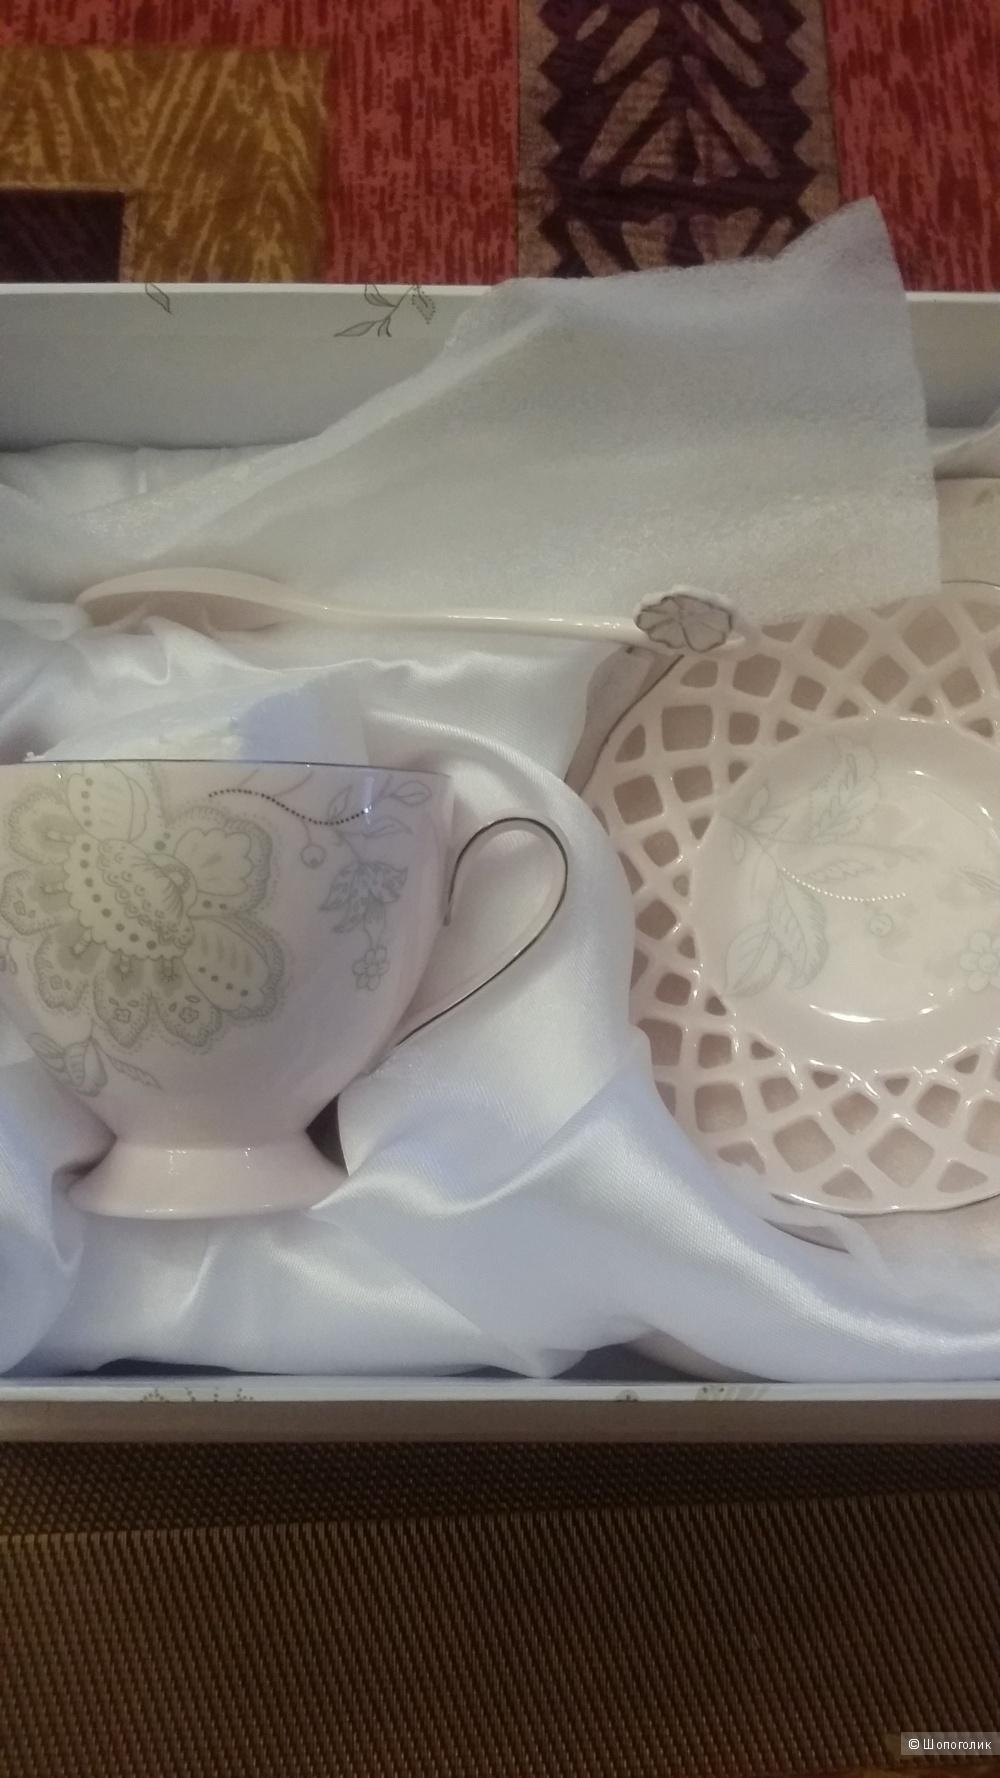 Комплект посуды  Lefard (2 шт) из фарфора пудрового цвета